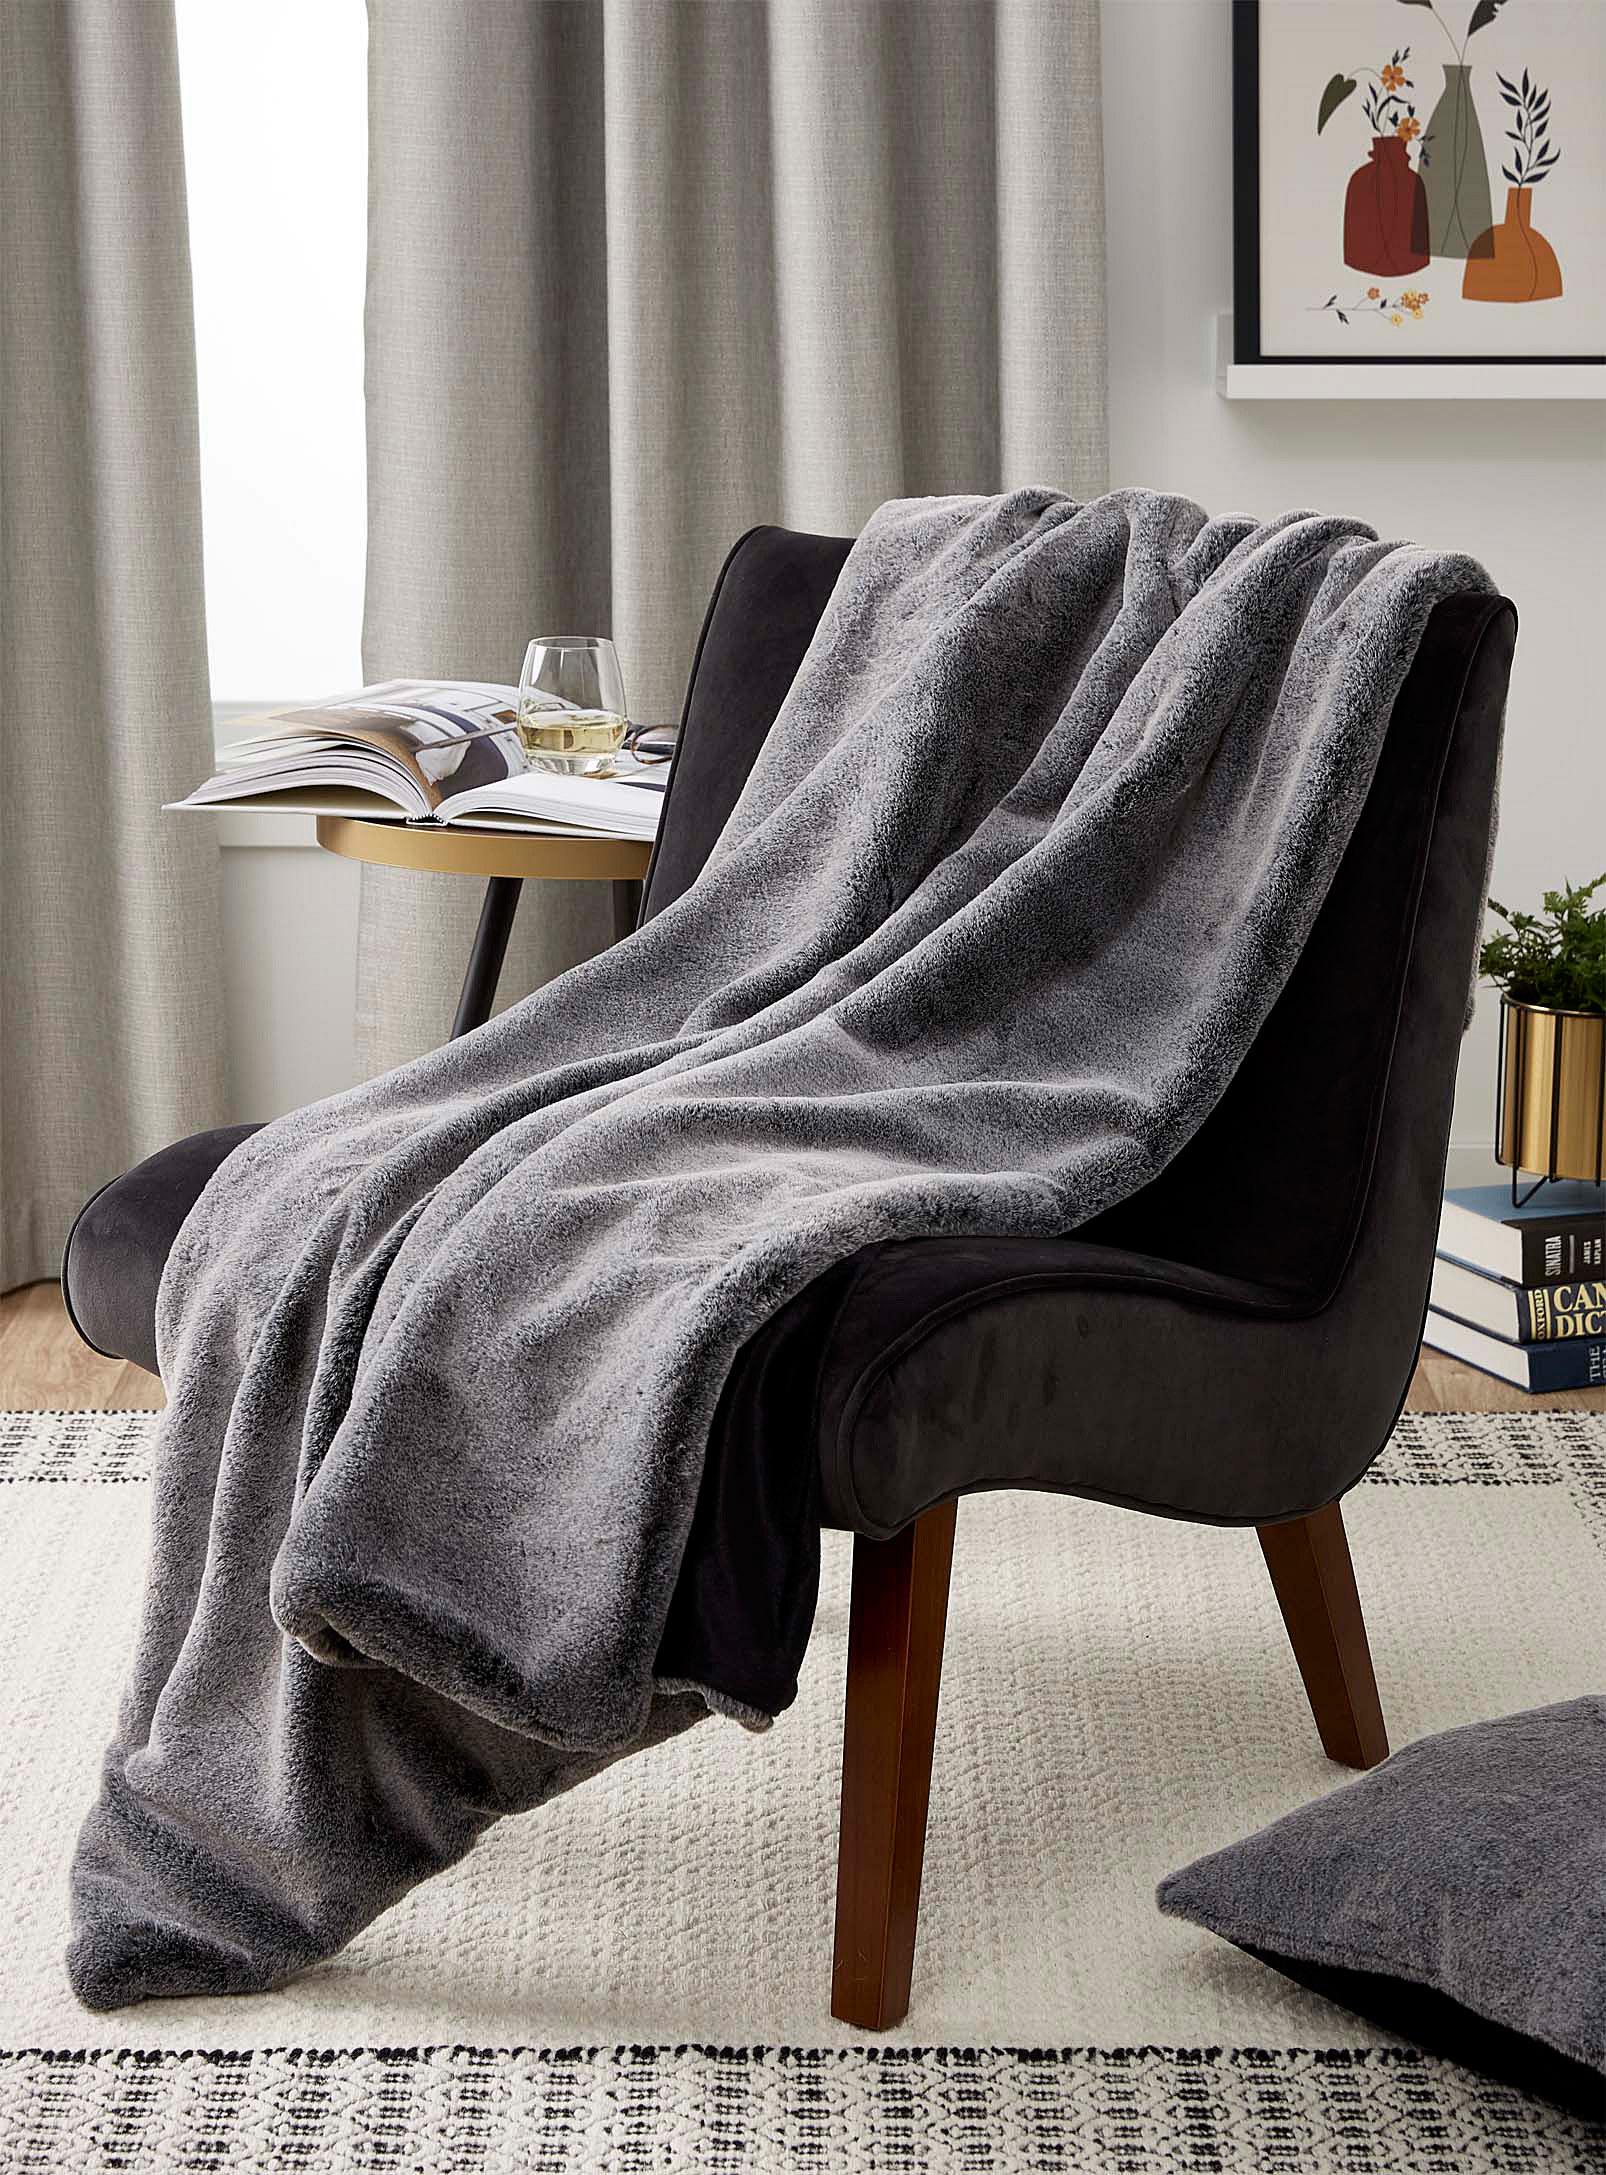 A fur throw over a chair